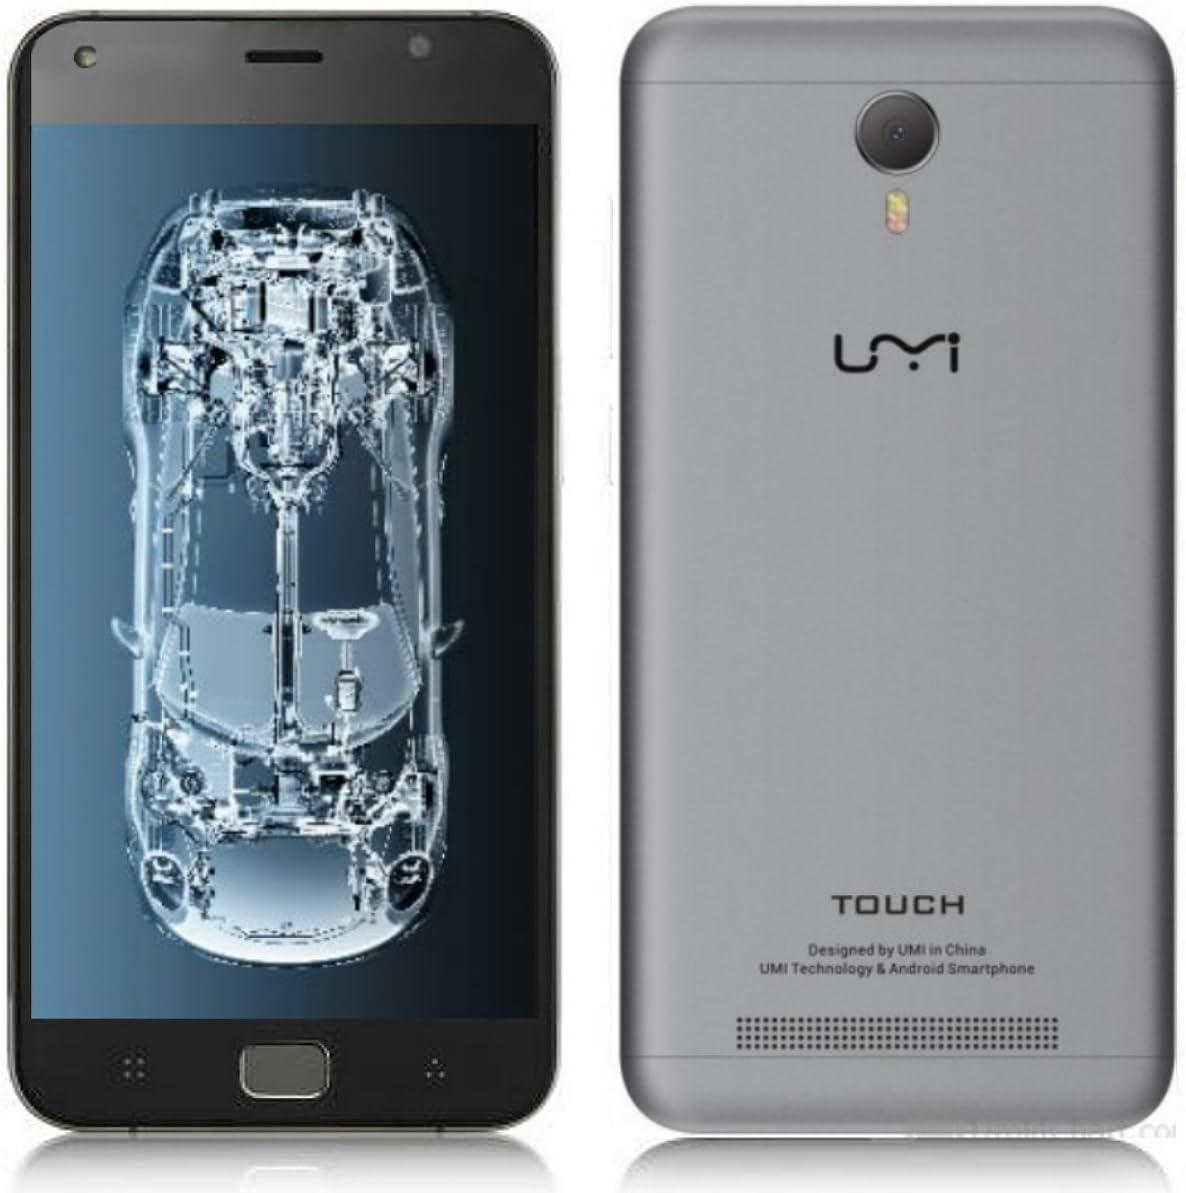 5.5schermo HD UMI Touch 4 G LTE FDD Smartphone Android 6.0 Octa ...